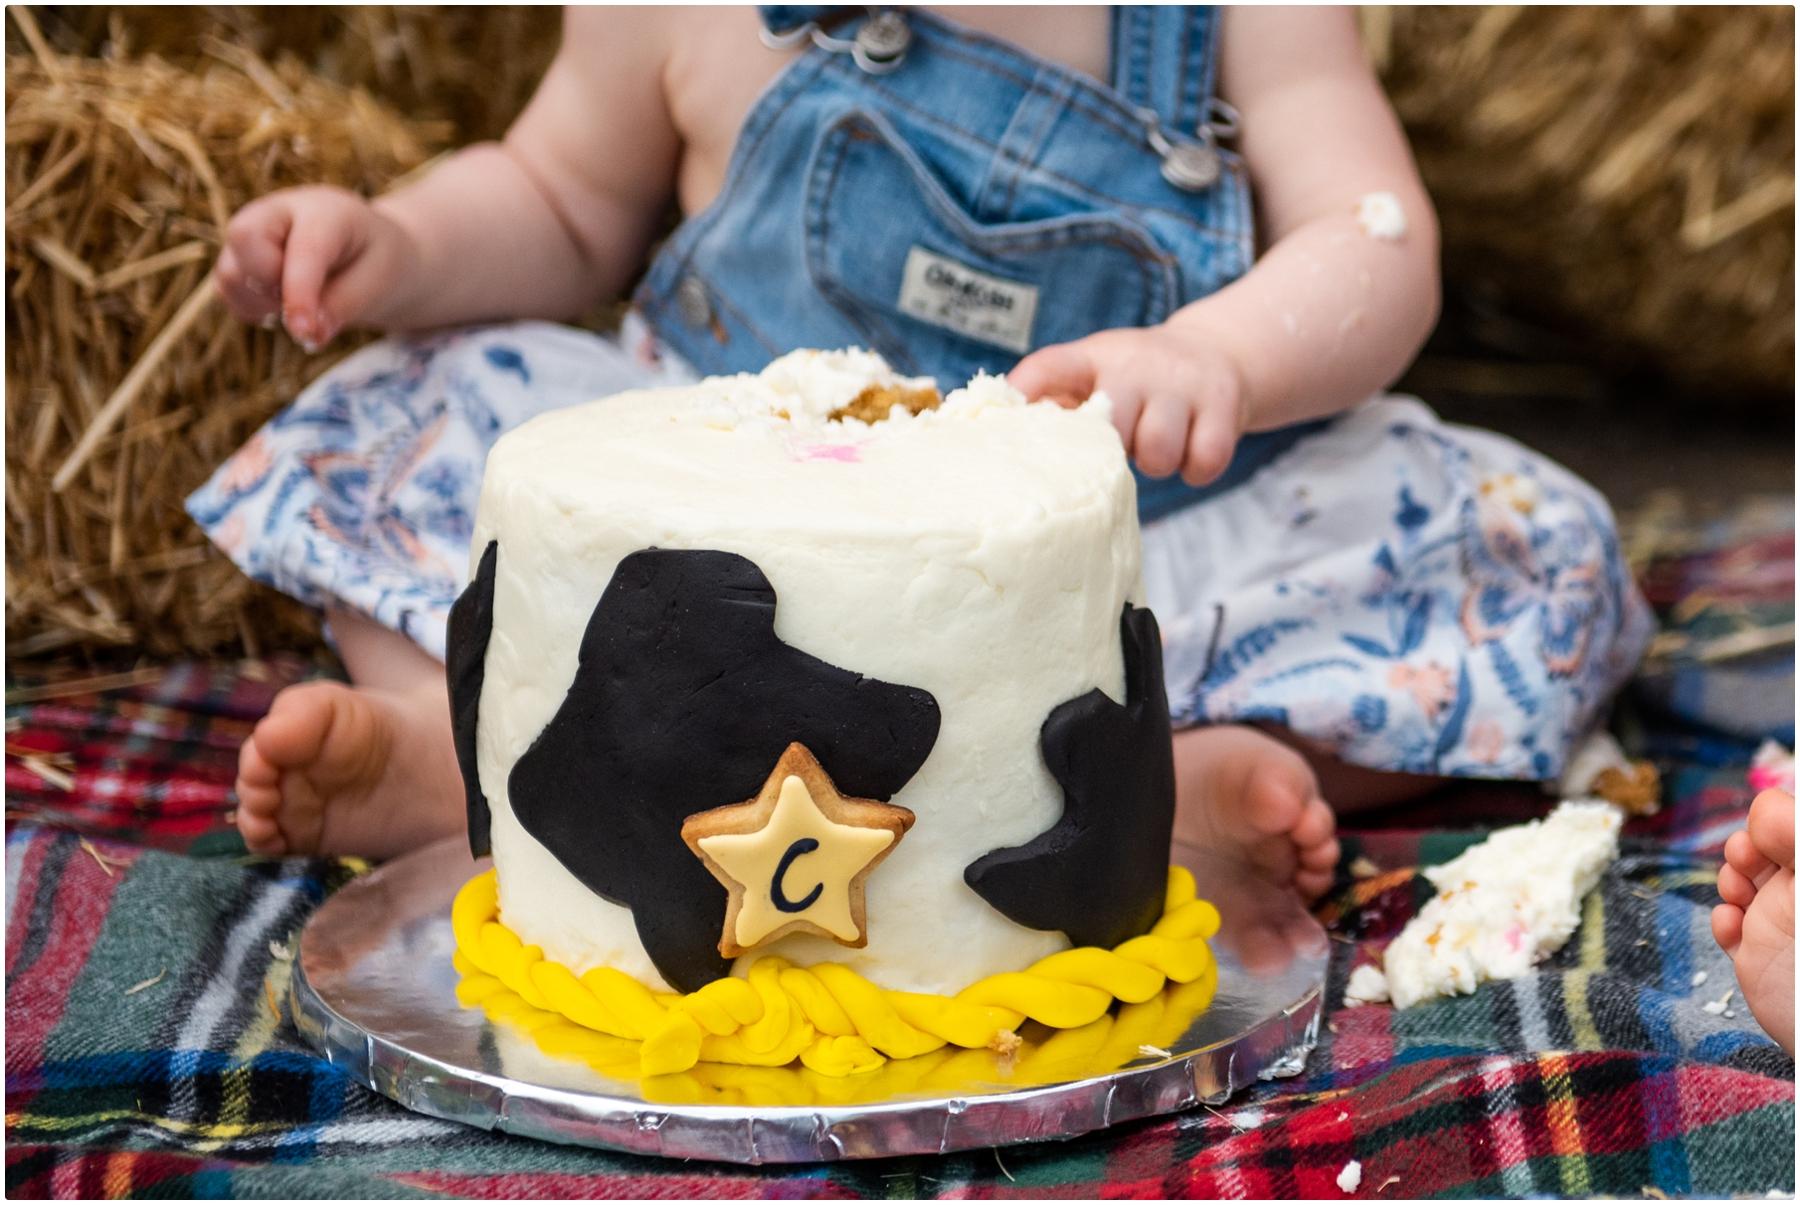 Calgary Cake Smash Photos- Barn Yard 1st Birthday Cake Smash